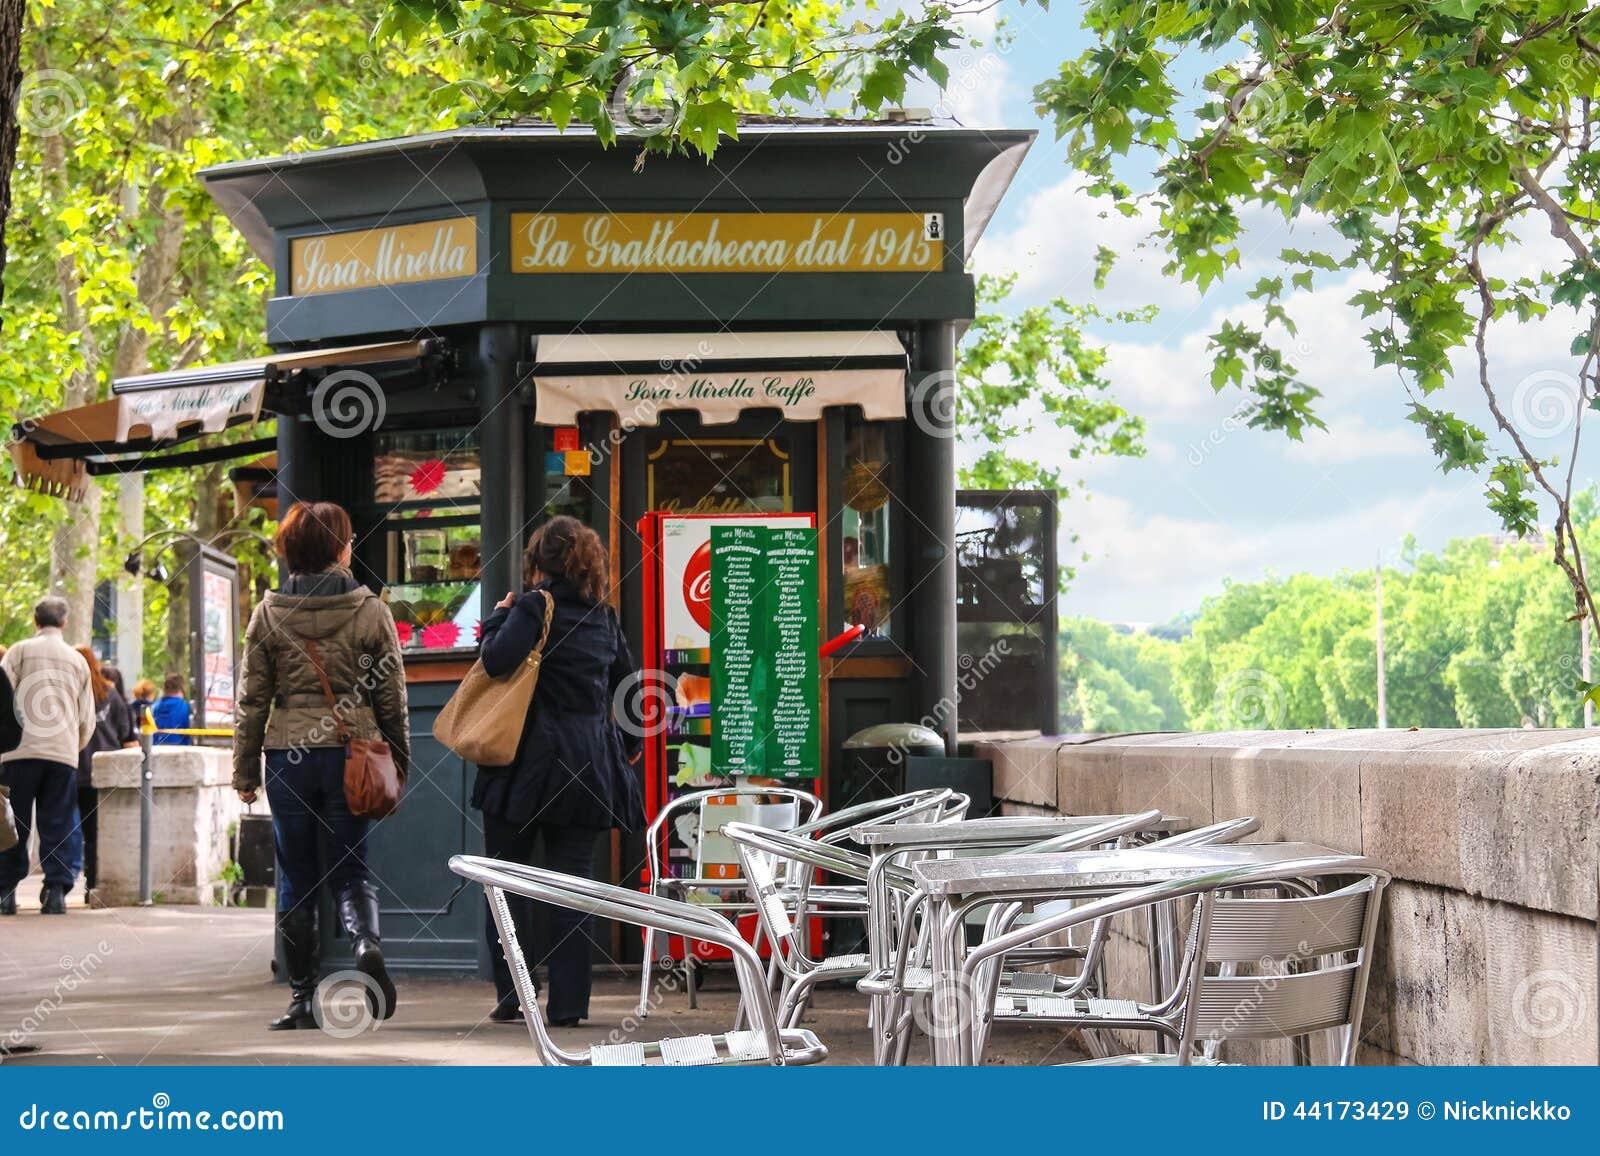 Roadside Cafe Menu